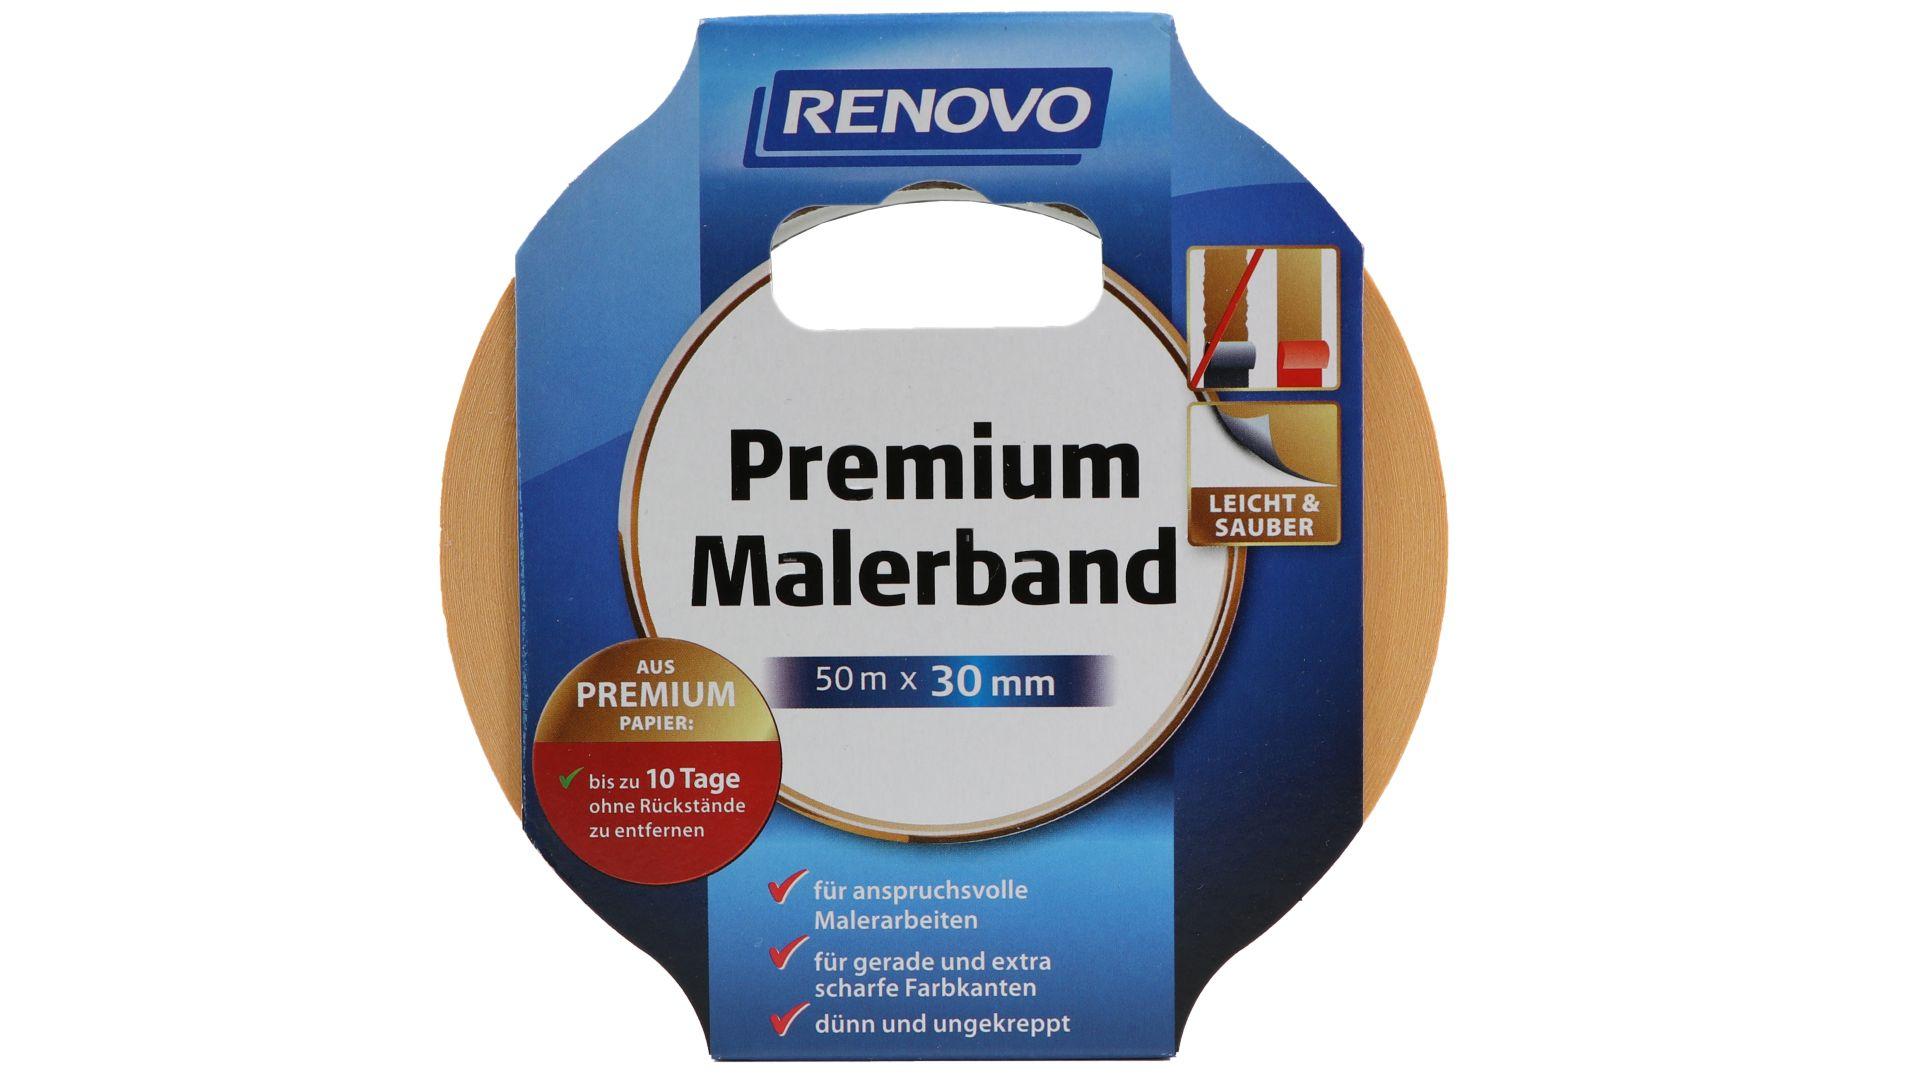 RENOVO Premium Malerband, 50 m x 30 mm